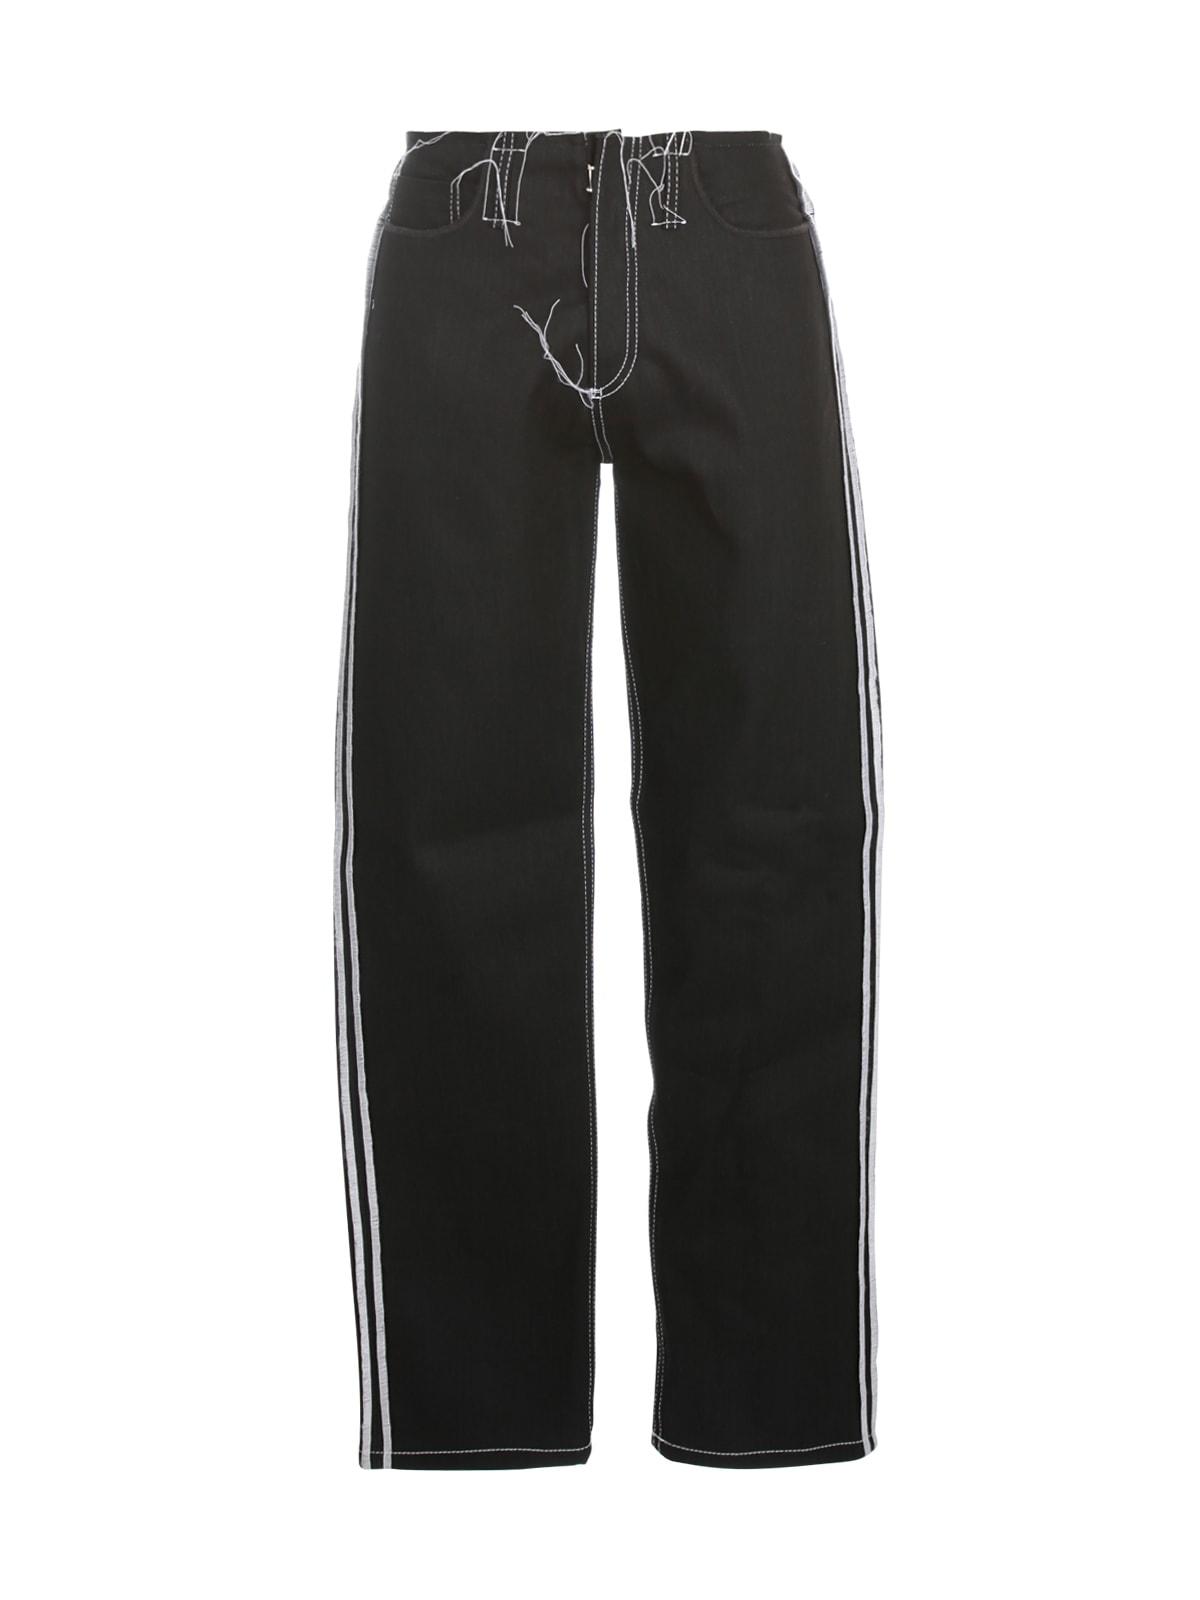 Maison Margiela Raw Jeans